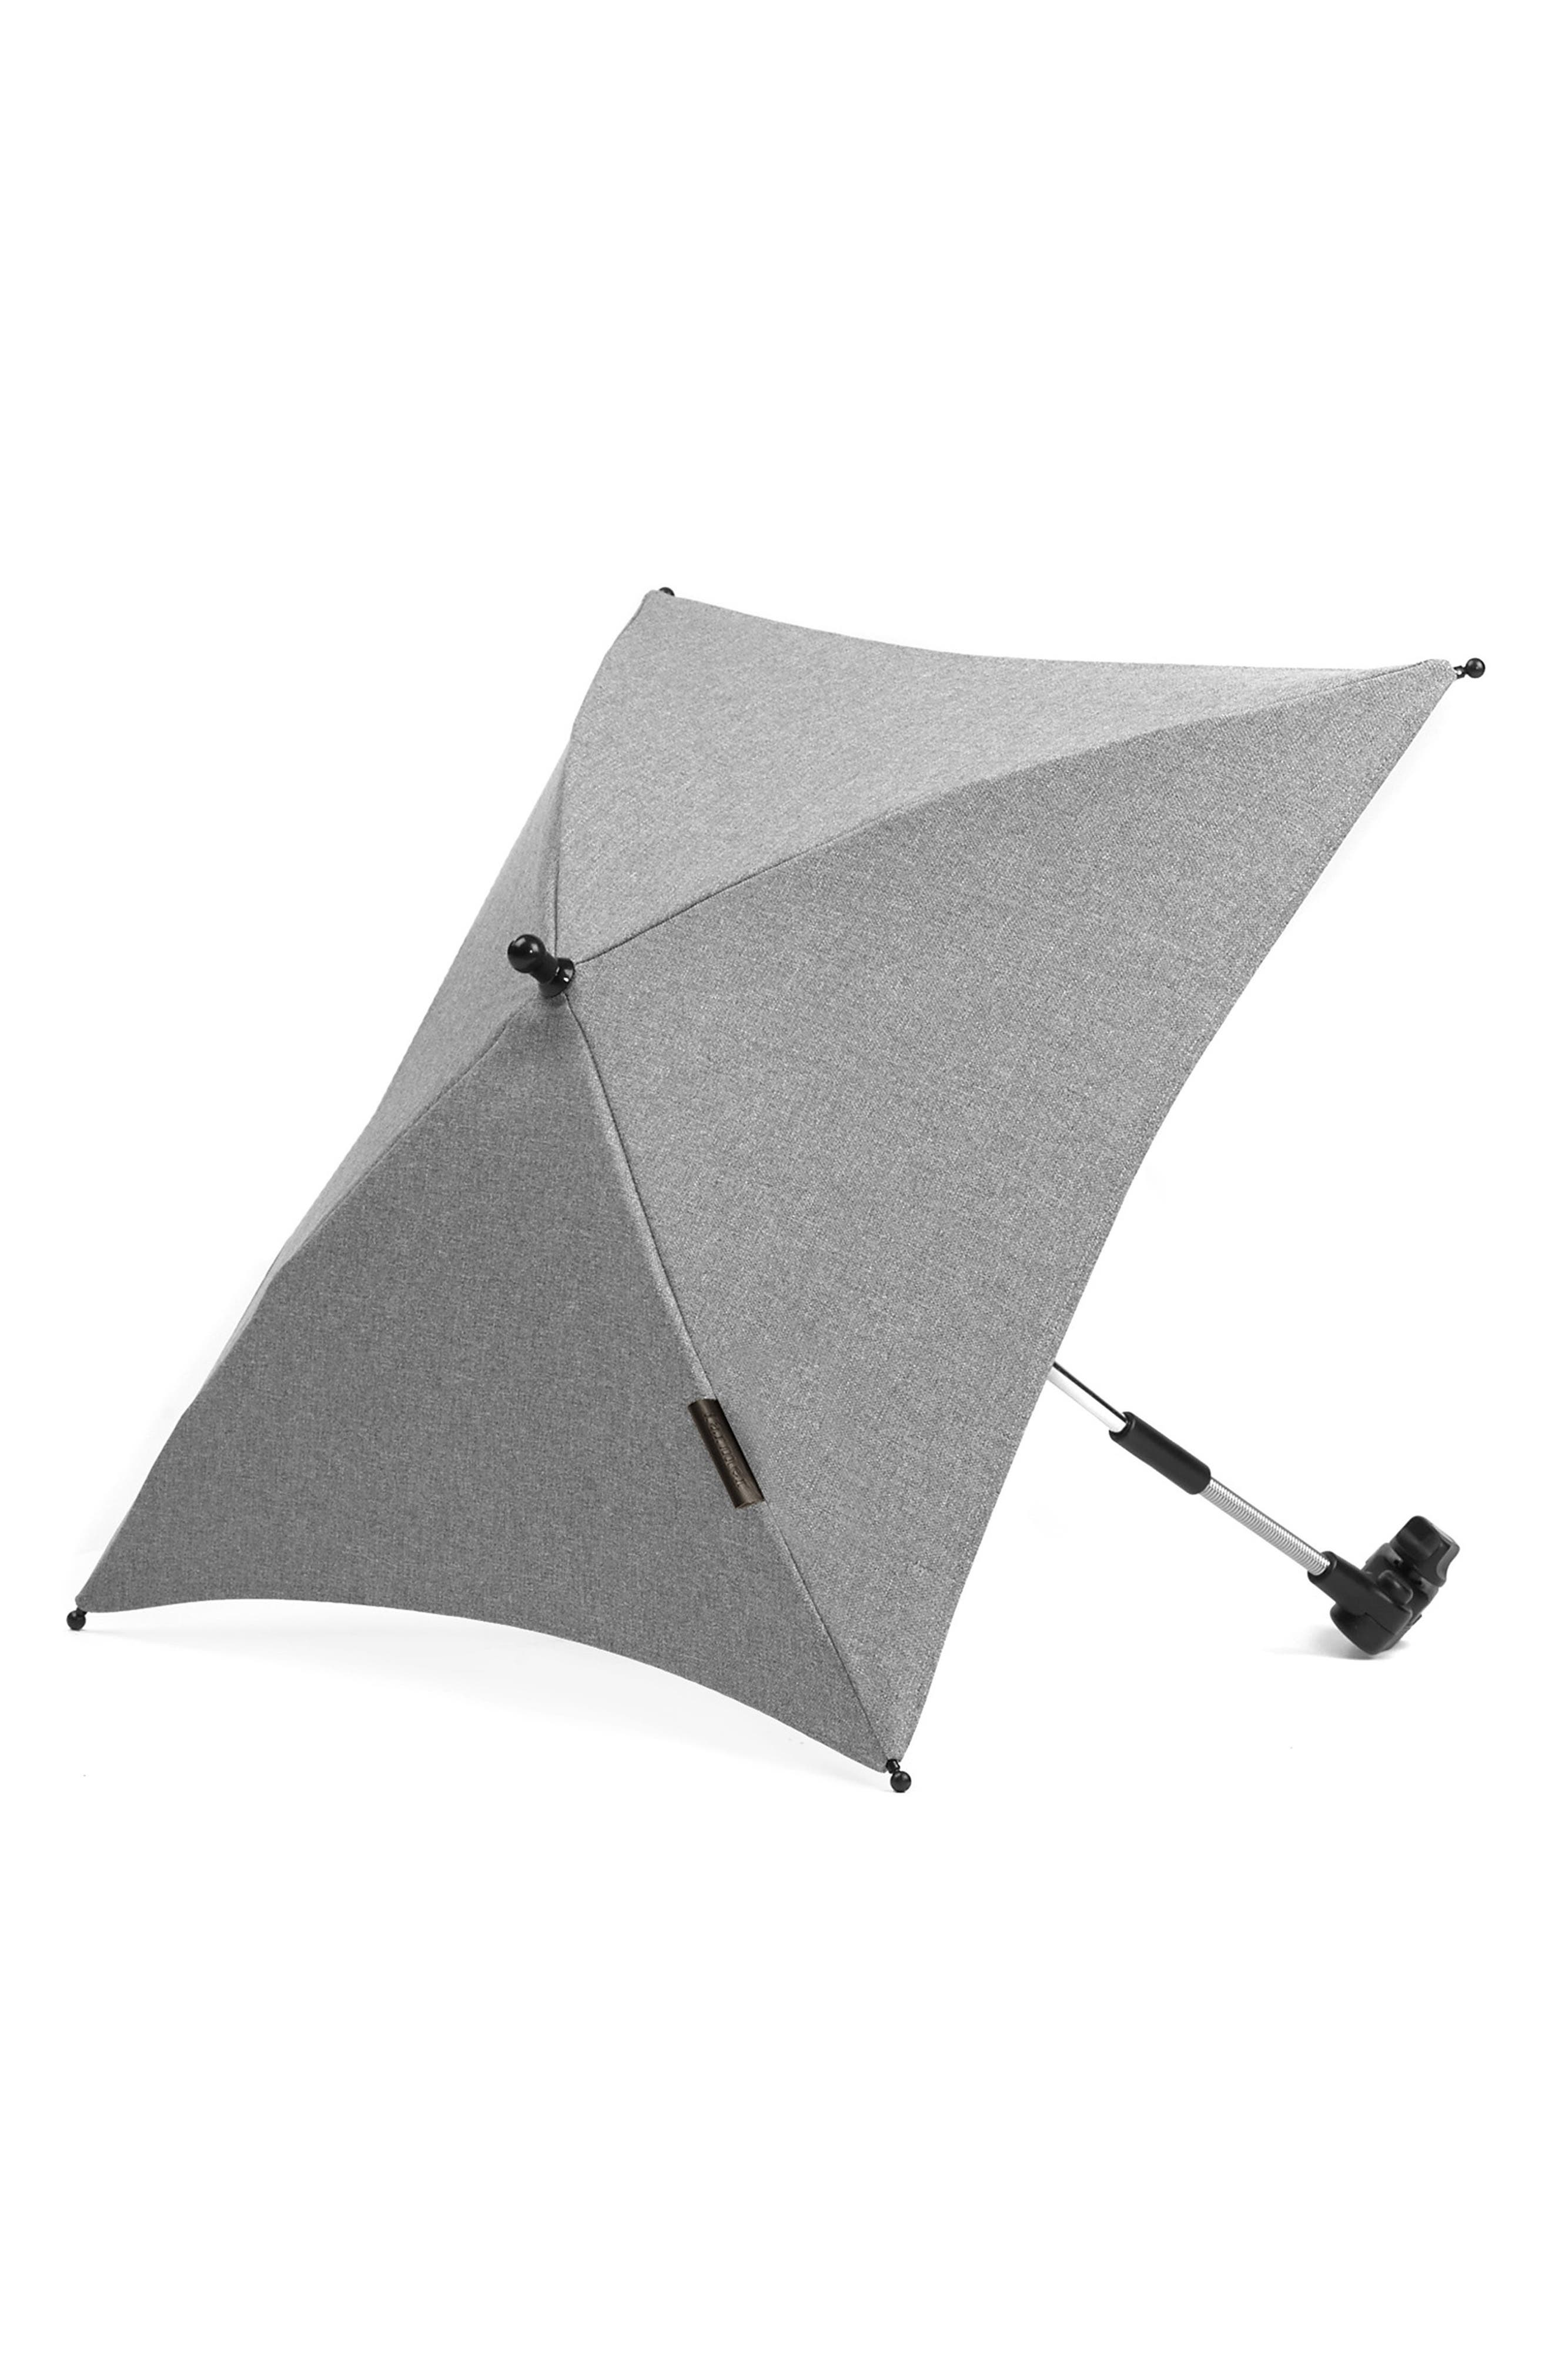 Evo - Farmer Stroller Umbrella,                         Main,                         color, Light Grey